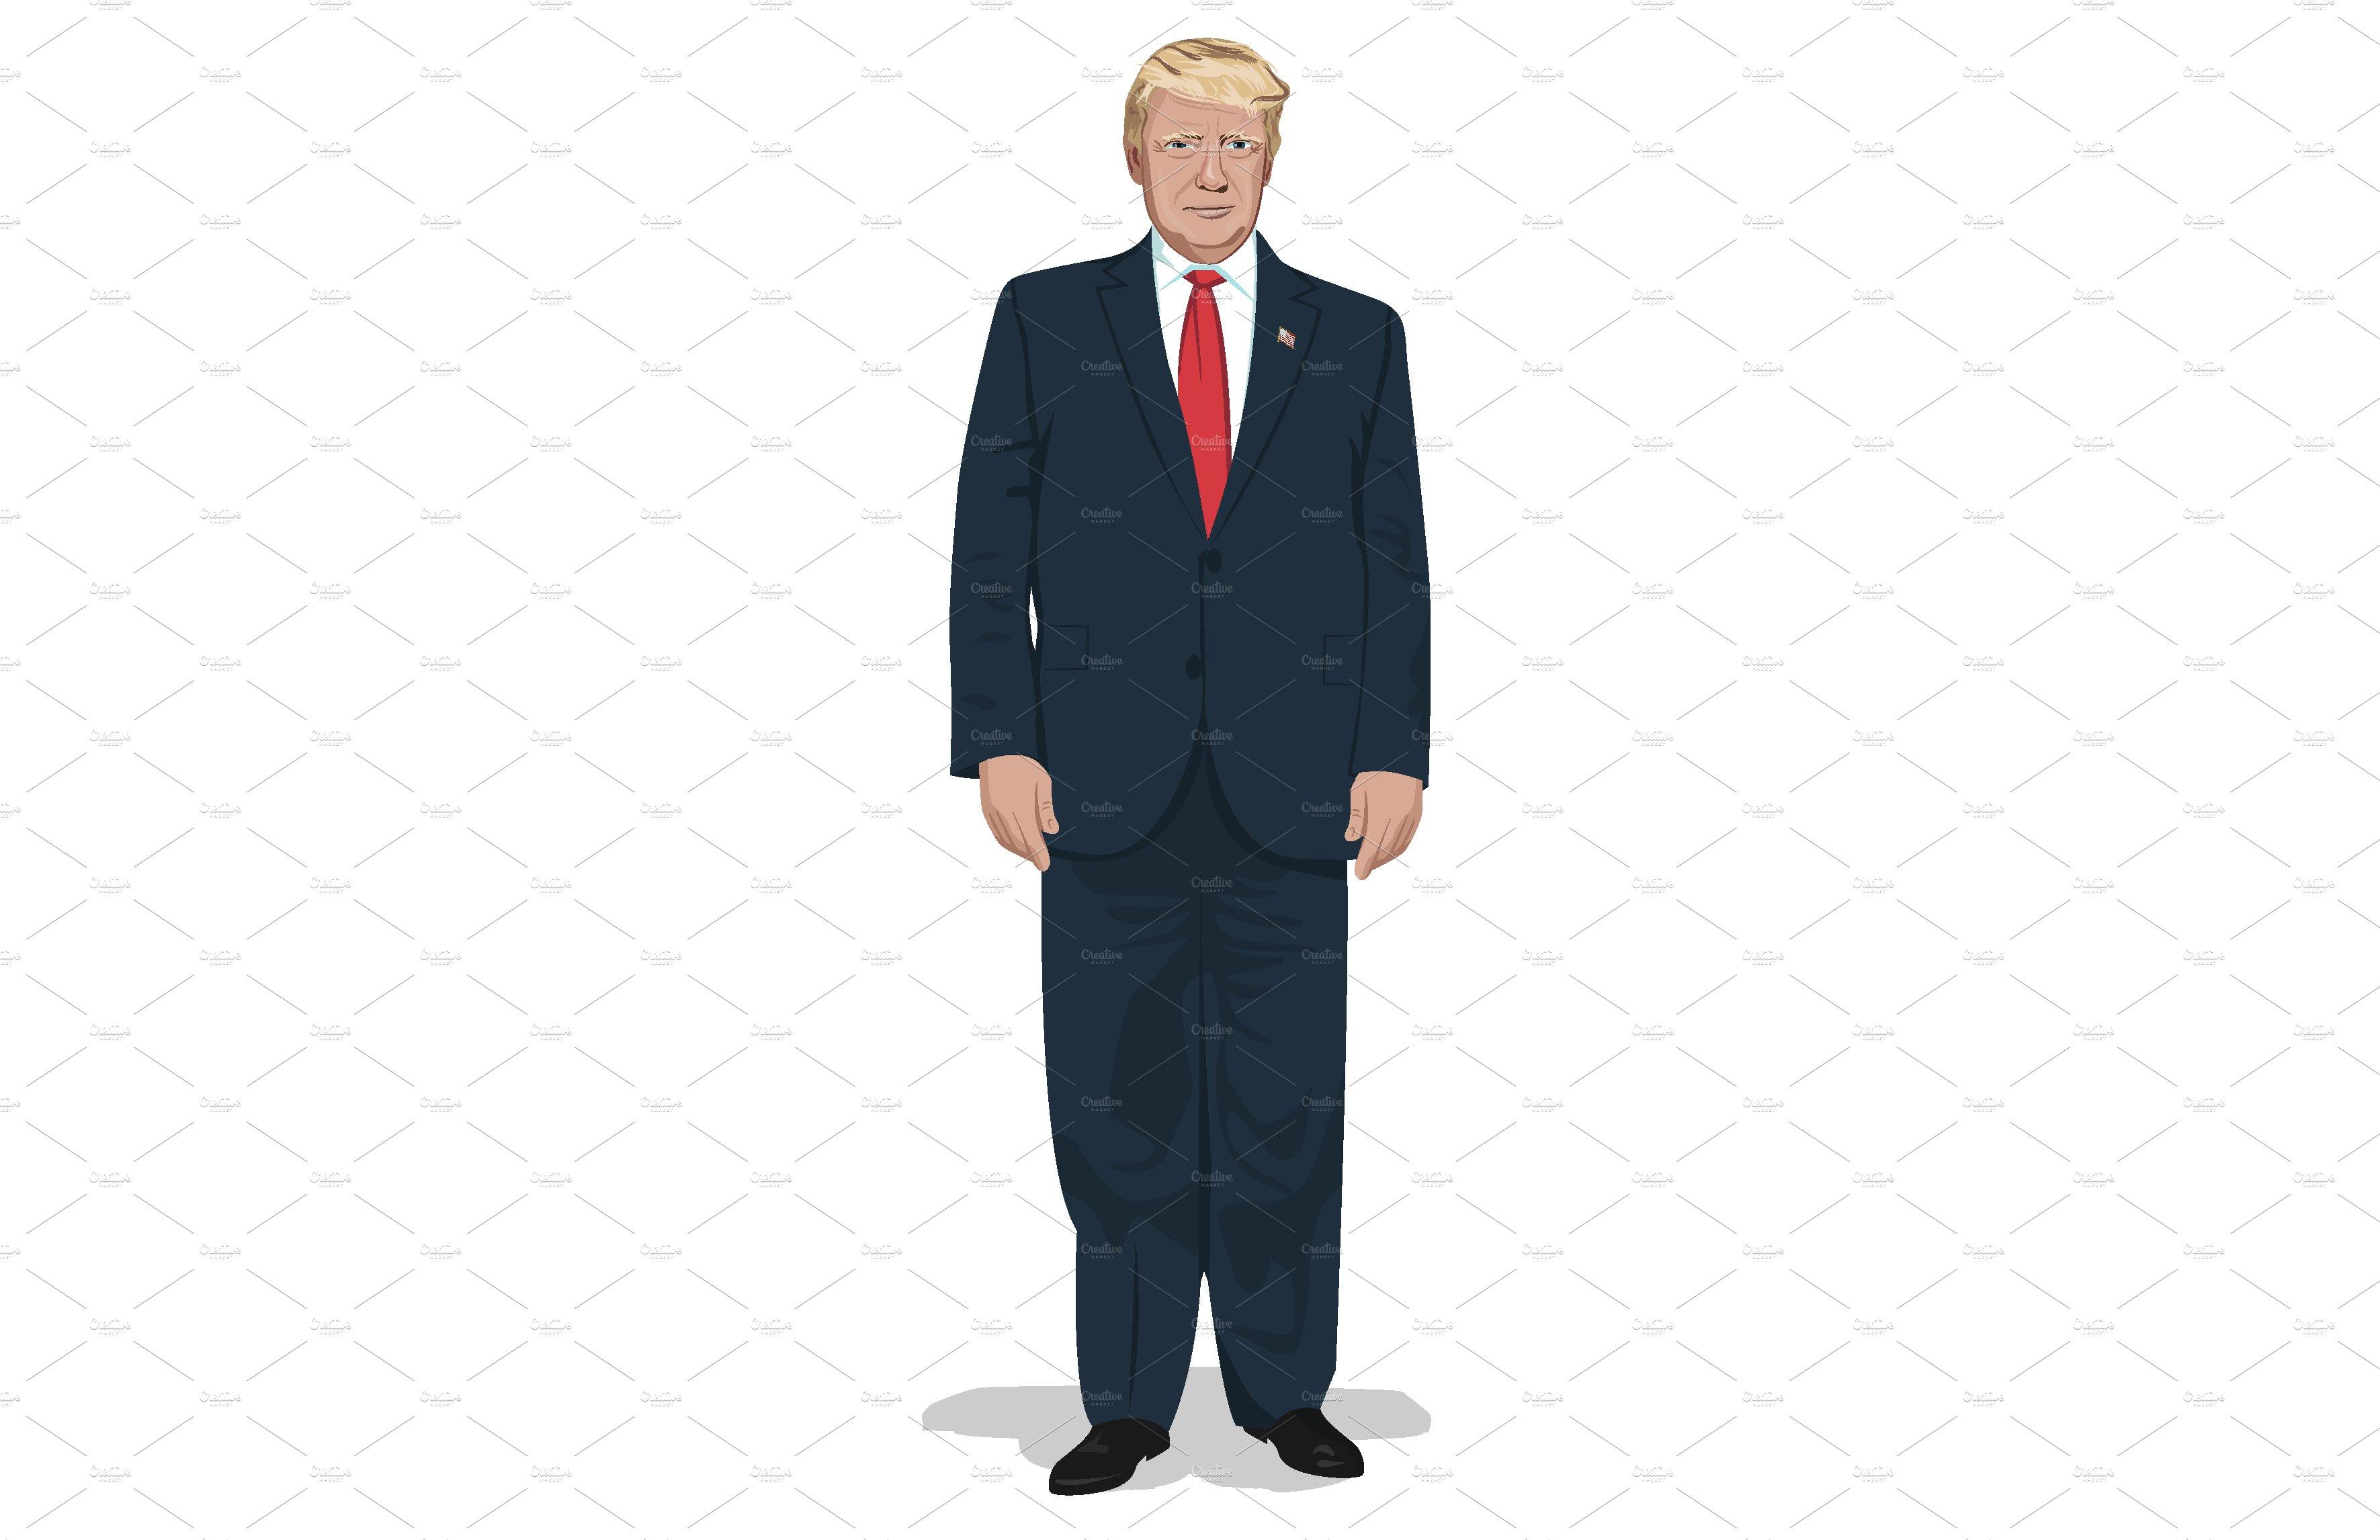 President Donald Trump full body.